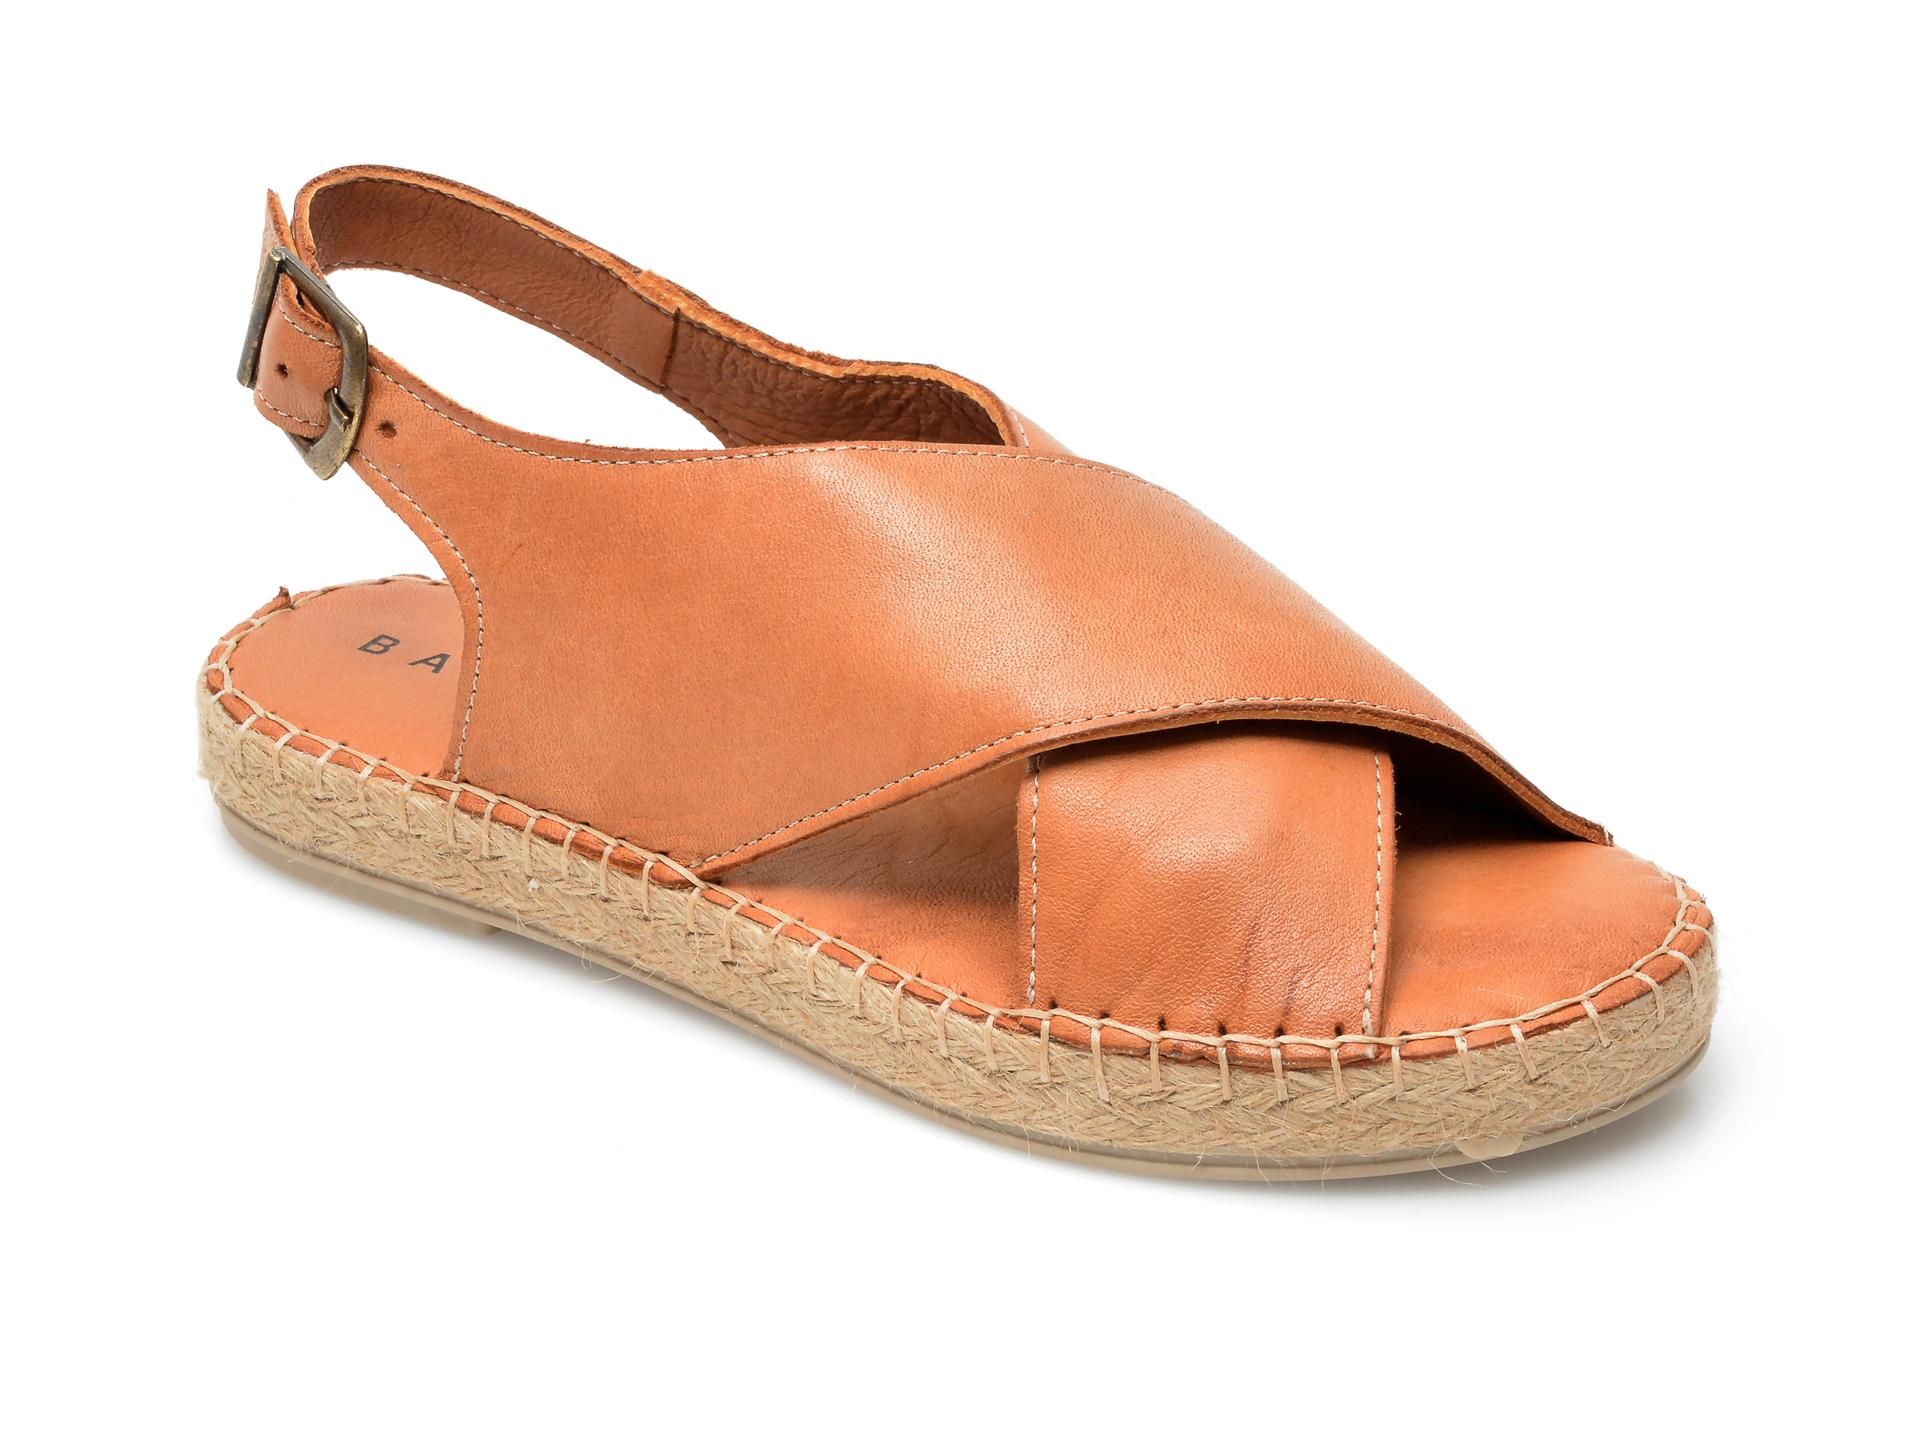 Sandale BABOOS maro, R05, din piele naturala imagine otter.ro